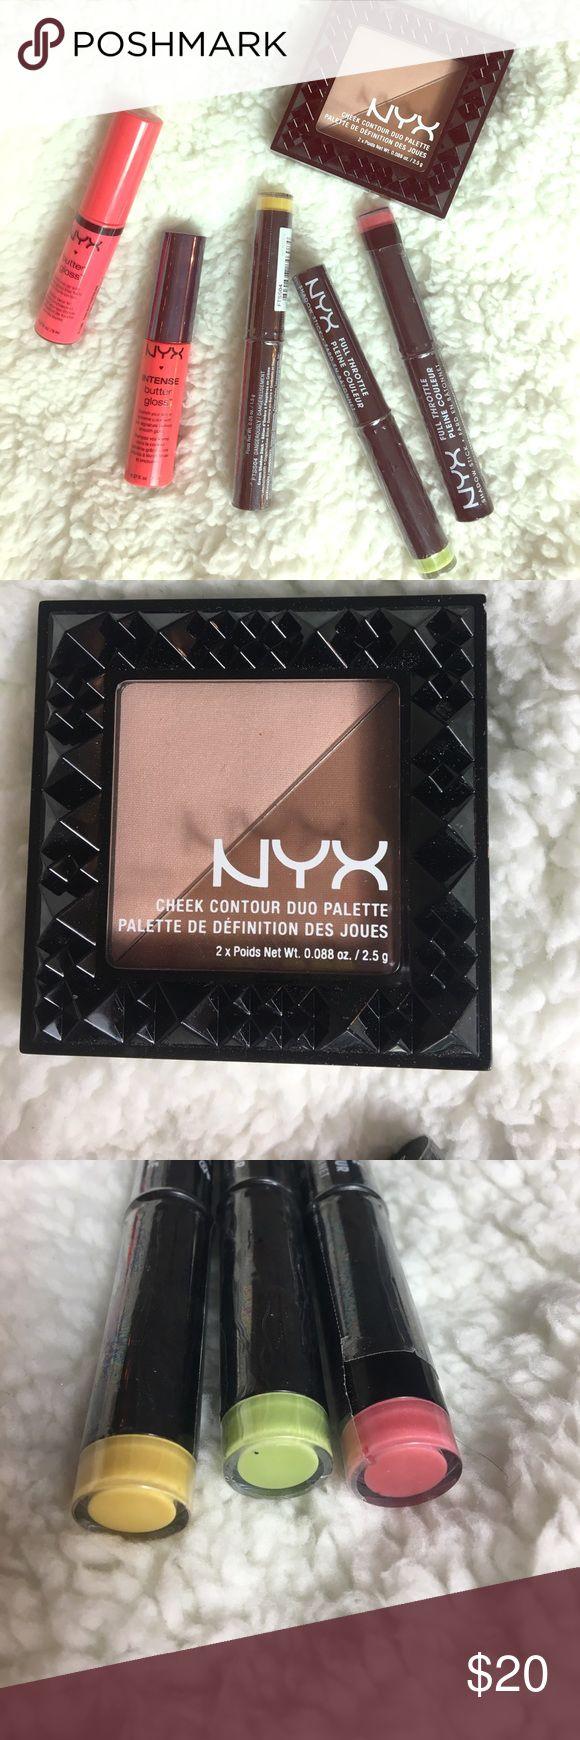 NYX lipgloss/shadow stick/ contour palette Two butter gloss lip glosses. One contour duo palette. Three full throttle shadow sticks NYX Makeup Eyeshadow